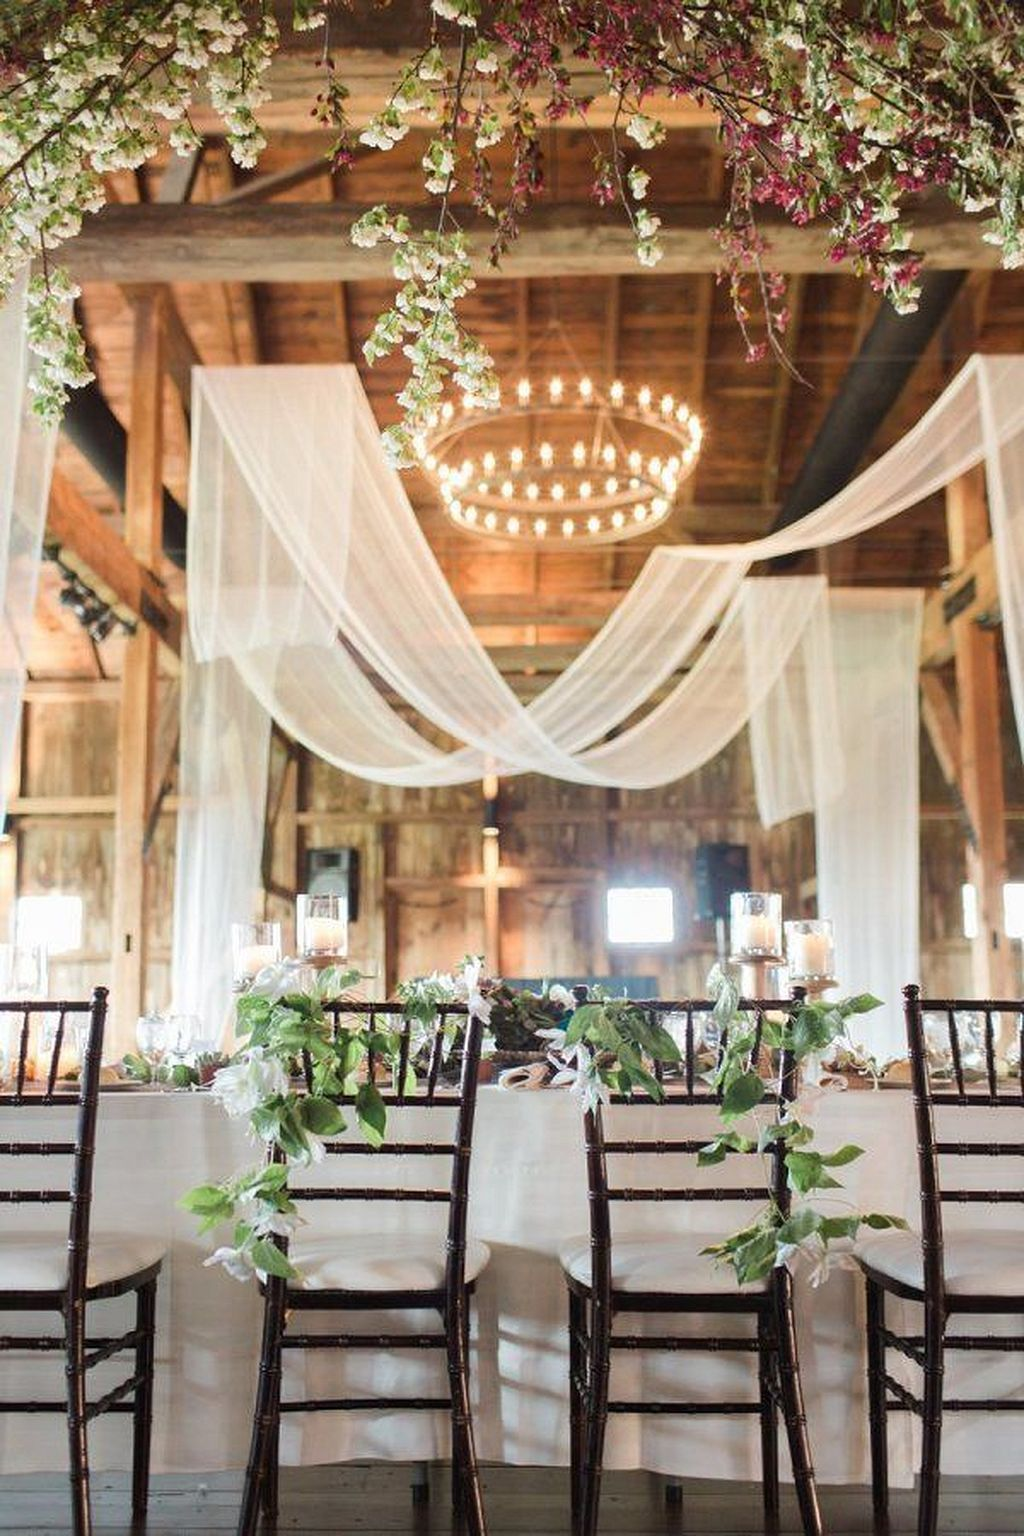 Farm wedding decor ideas   Beautiful Hanging Wedding Decor Ideas  Weddings